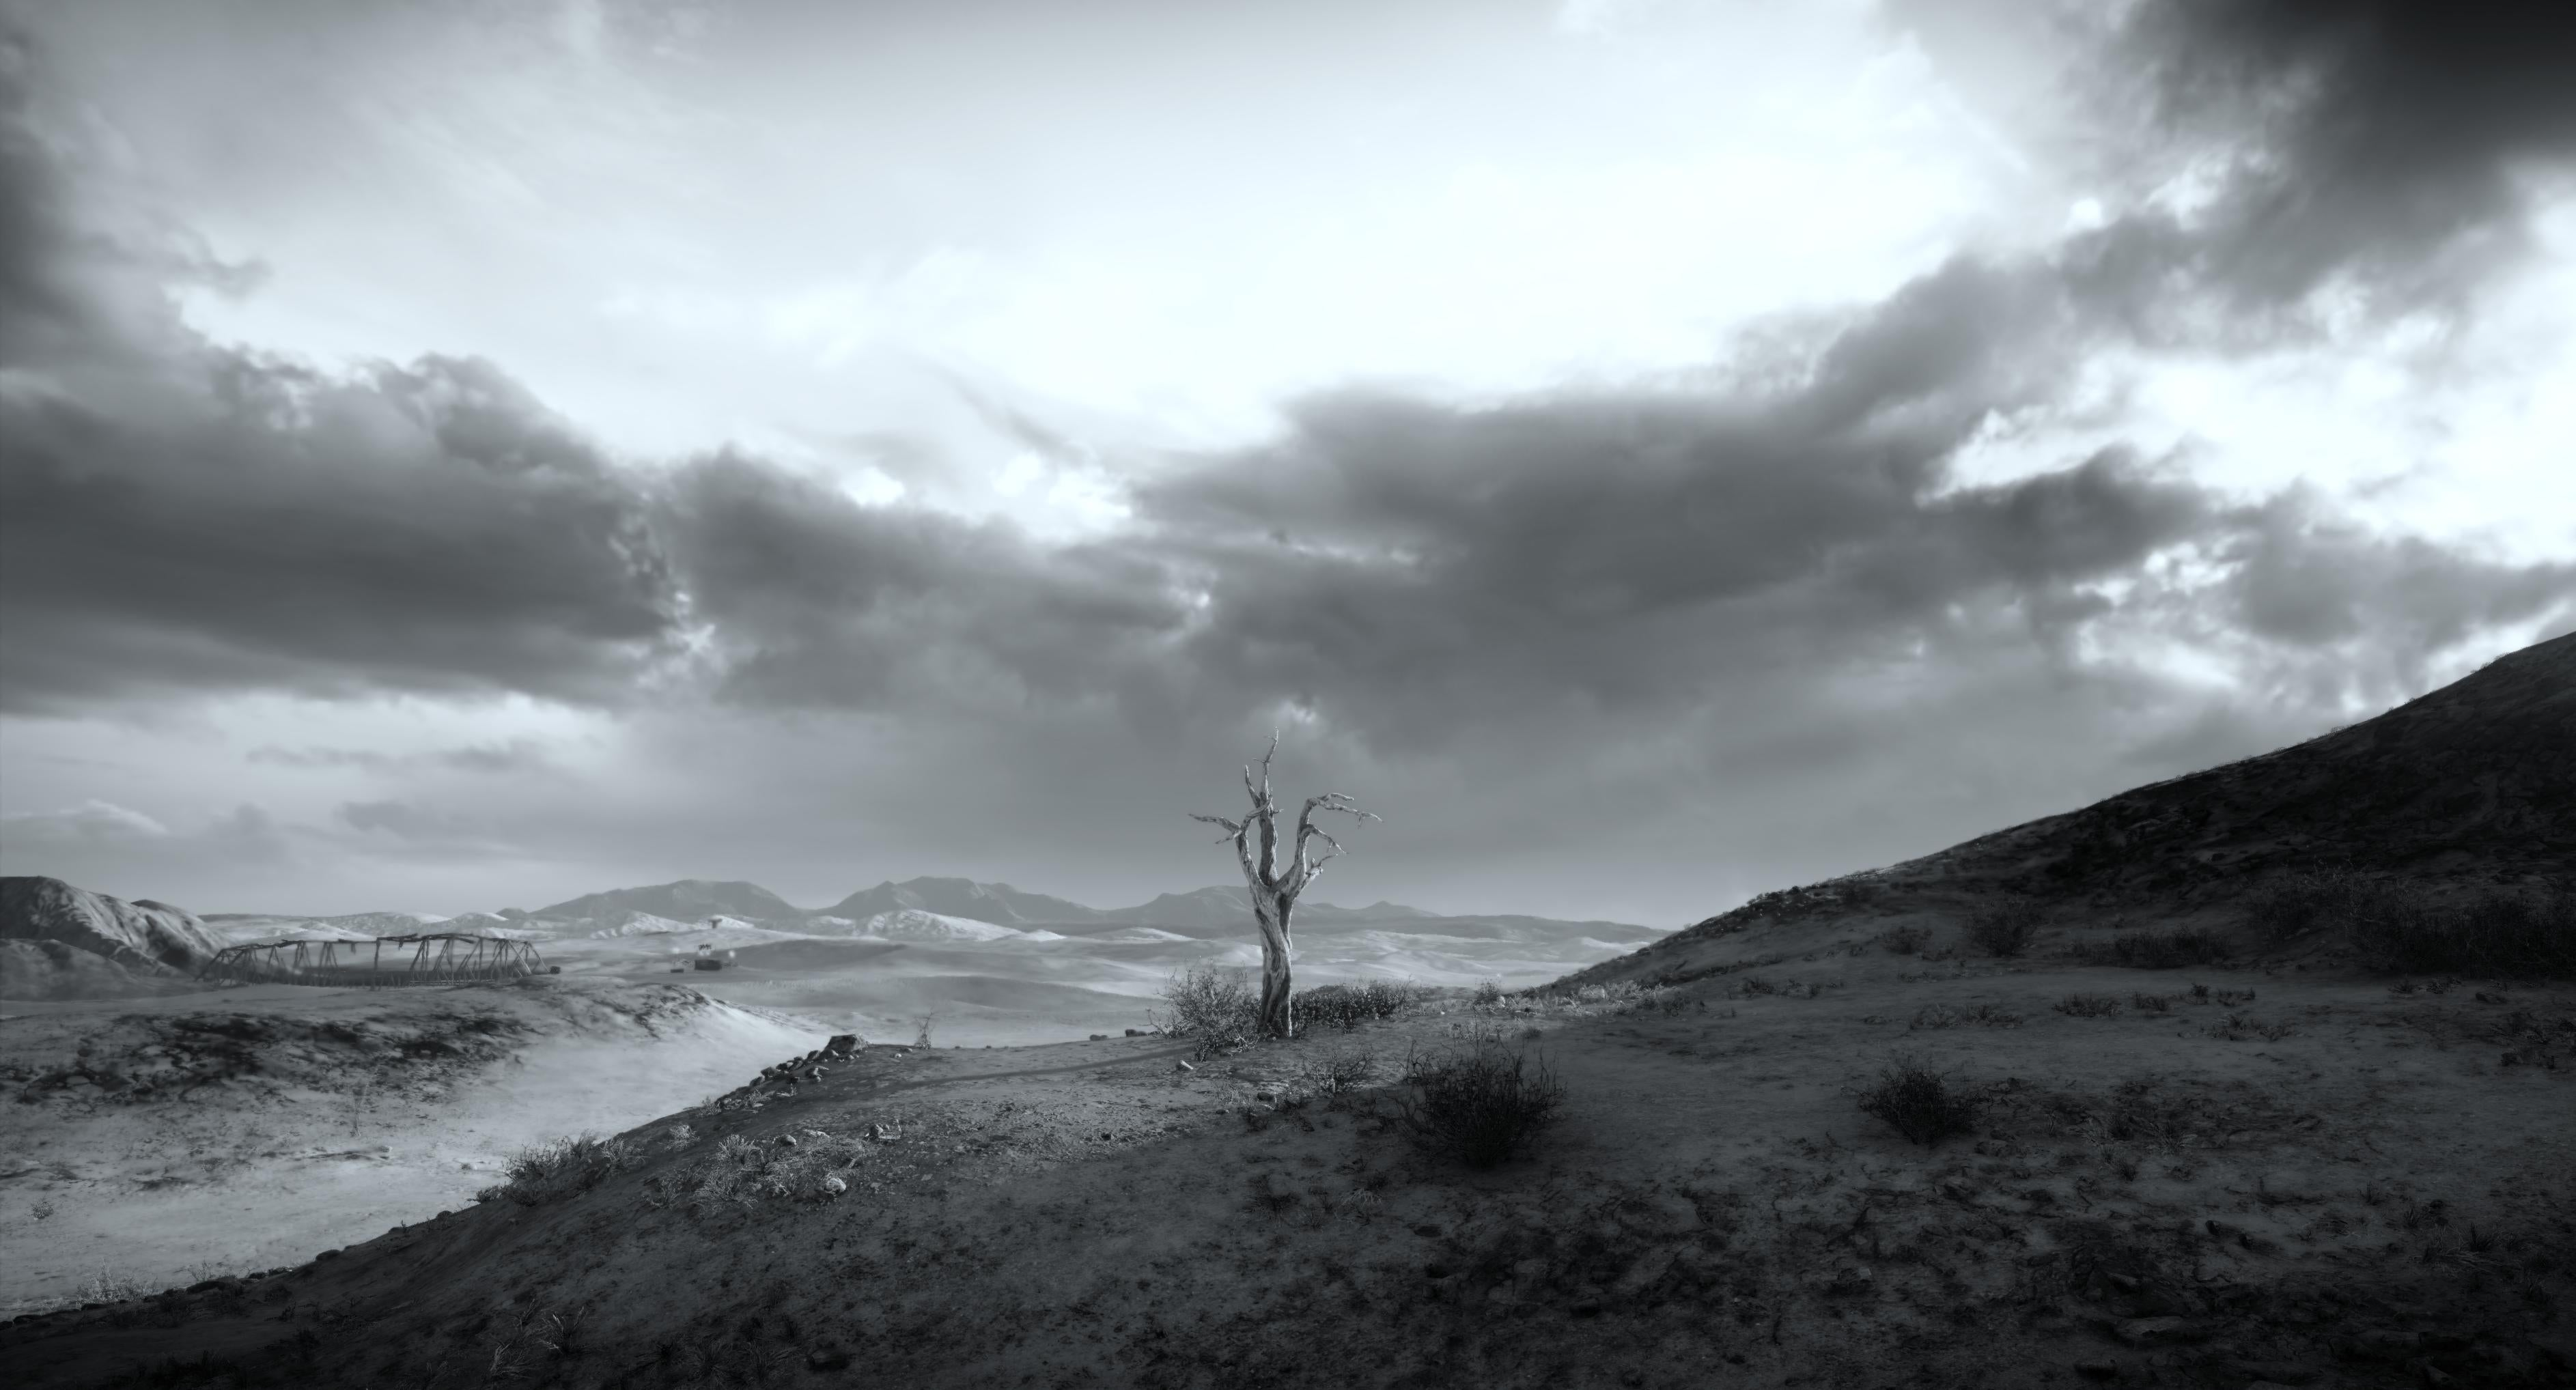 Video Game Screenshots As Art (Or Wallpaper)